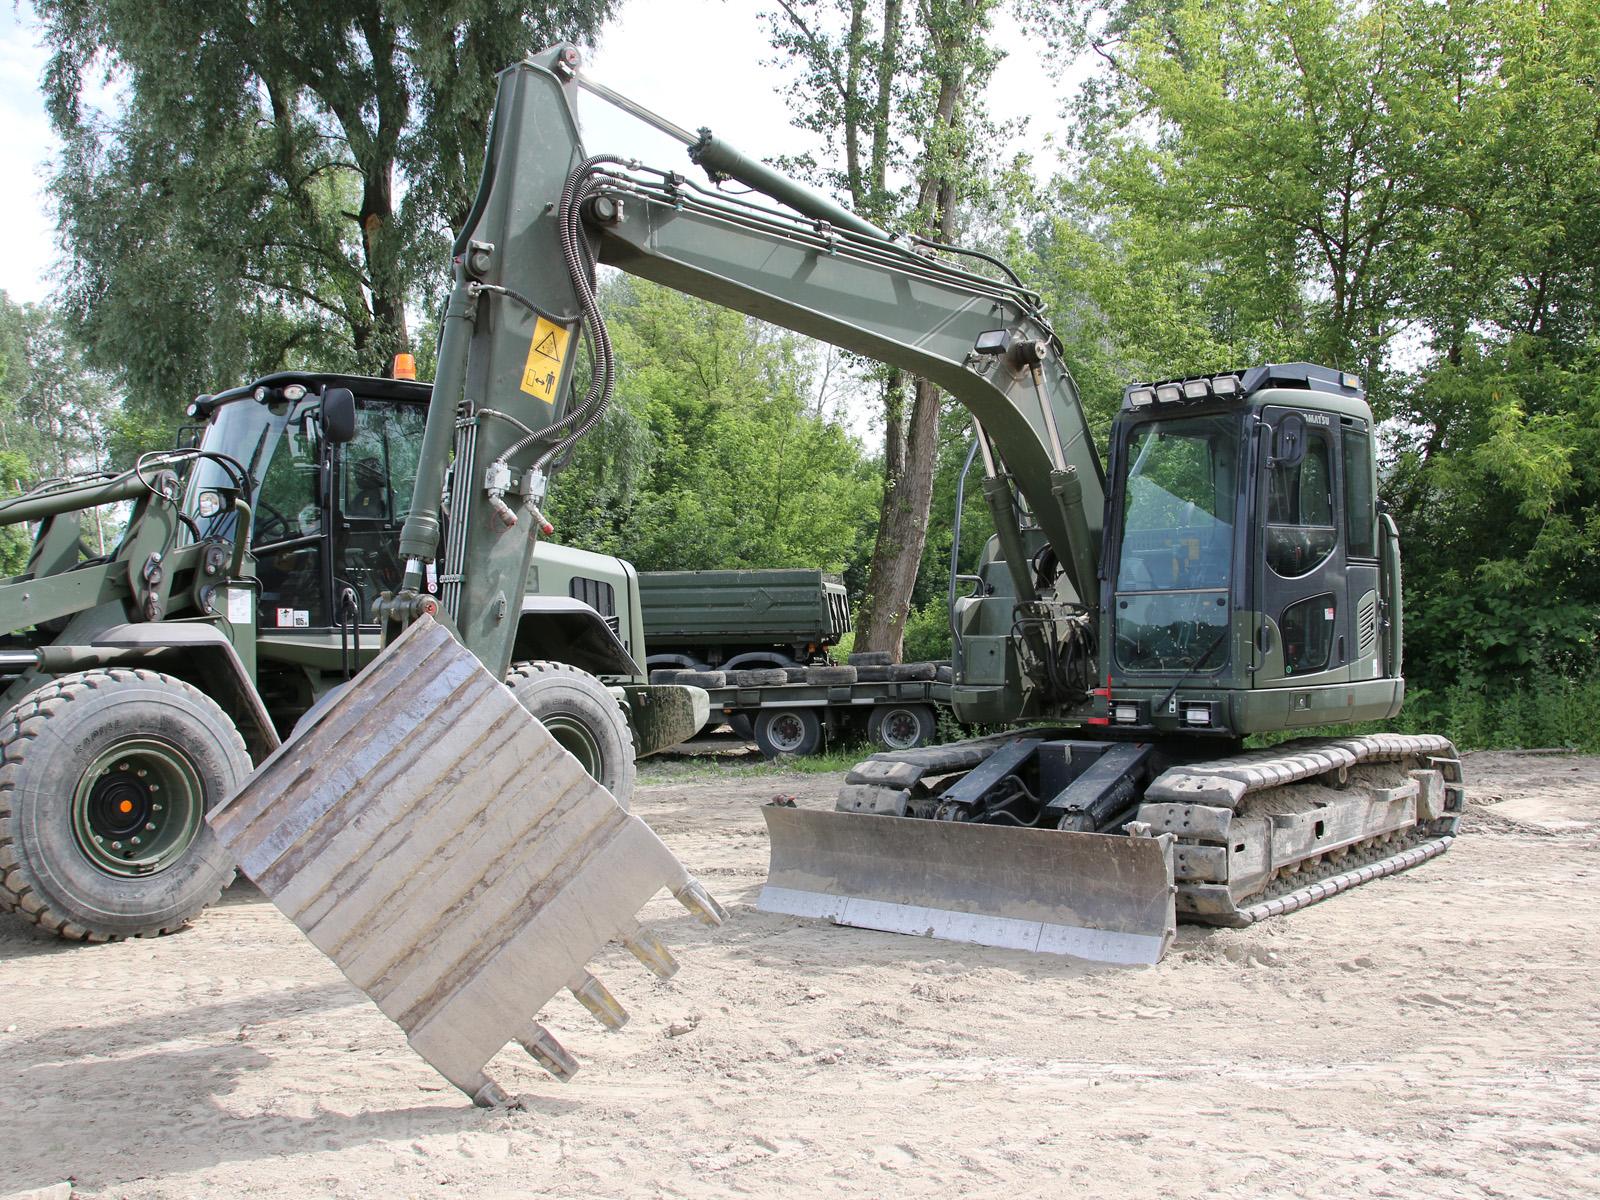 Hydraulikbagger Komatsu PC138US-10 © Doppeladler.com